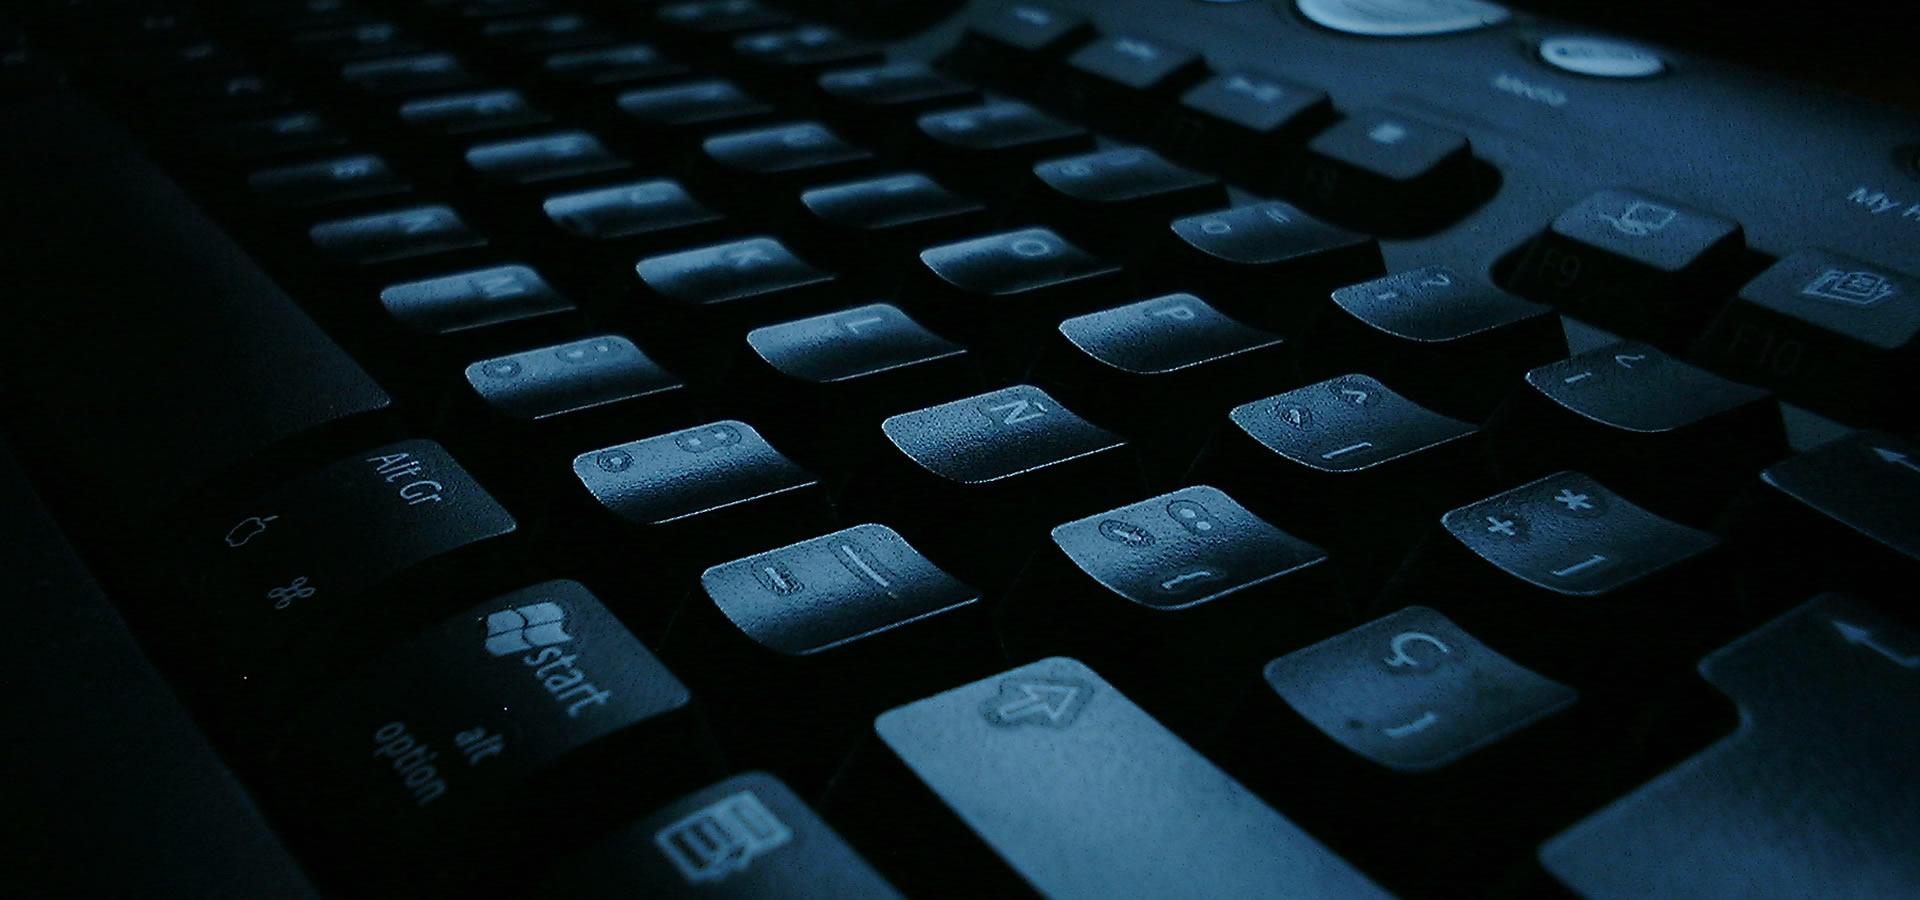 APB Computers